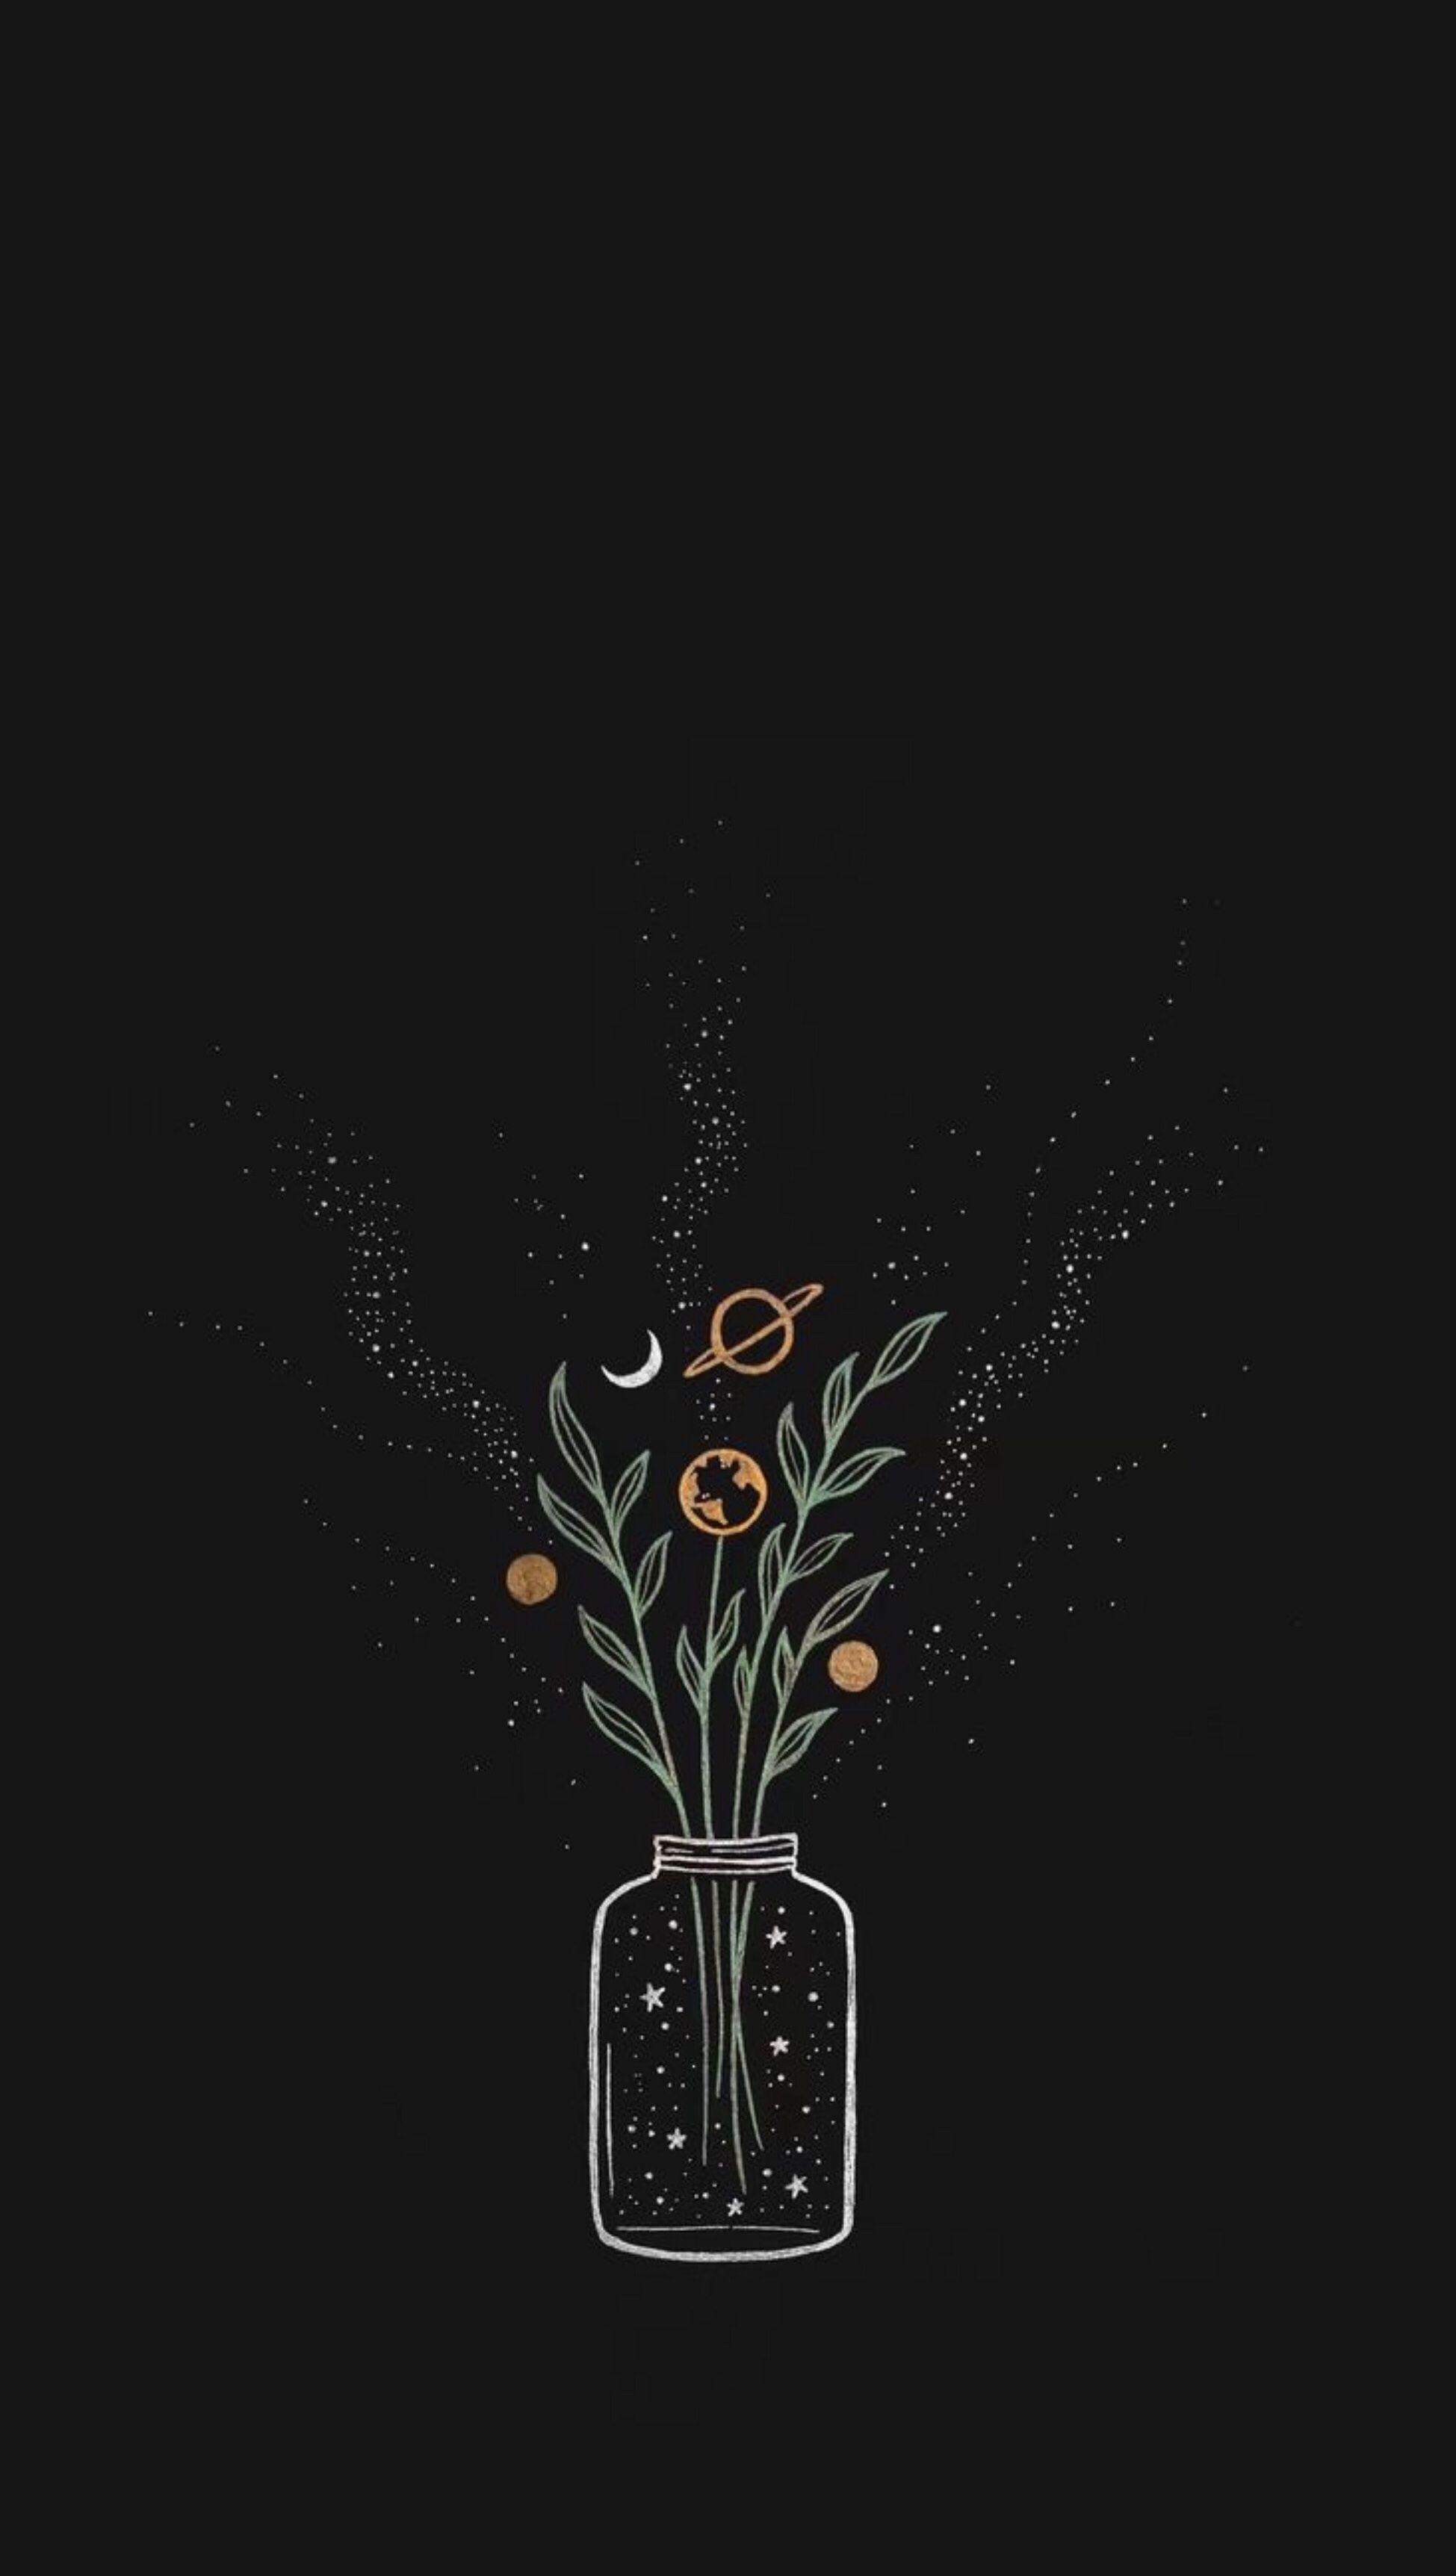 Pin By Atousa On Fondos Black Aesthetic Wallpaper Aesthetic Pastel Wallpaper Iphone Background Wallpaper